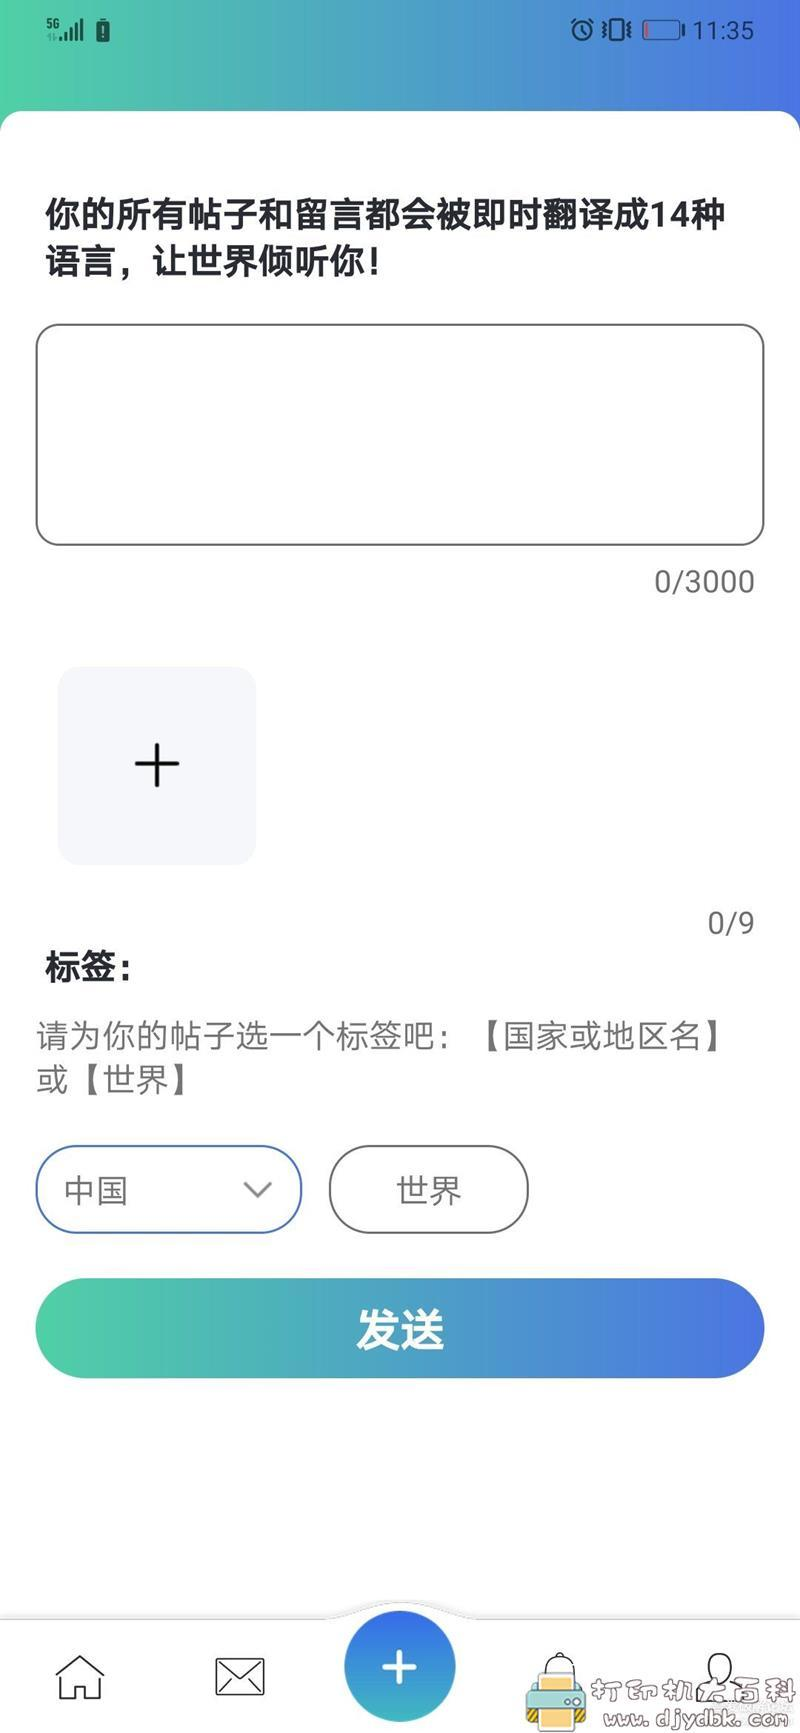 [Android]真实与老外一起学语言的软件《与我》最新版v1.4.8图片 No.5